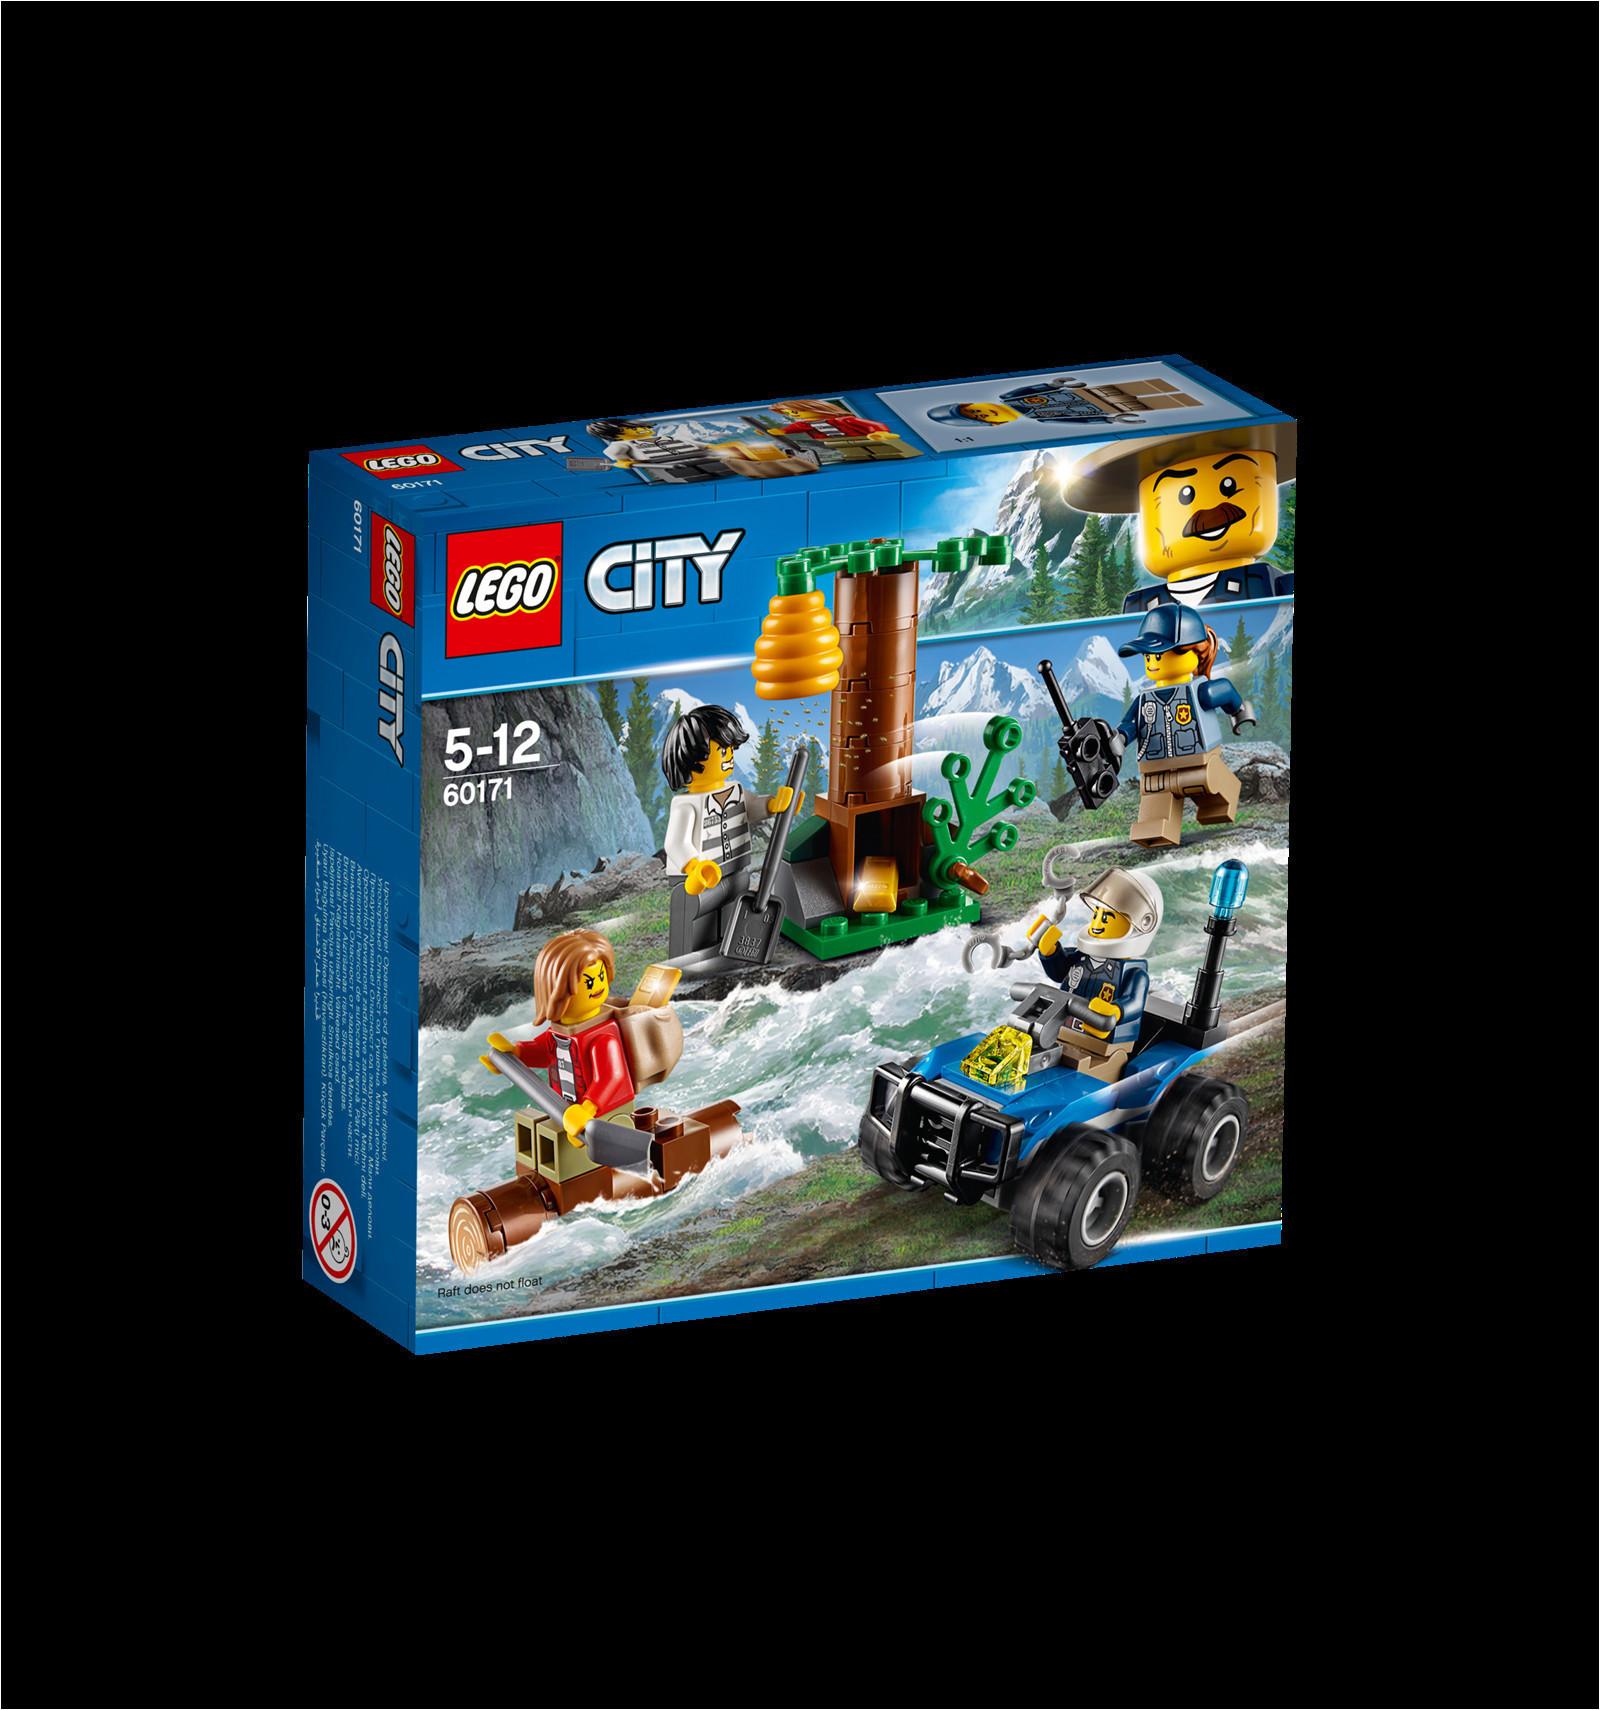 Ausmalbilder Lego City Genial Ausmalbilder Lego City Lego Captain America Divers 90 Neu Bilder